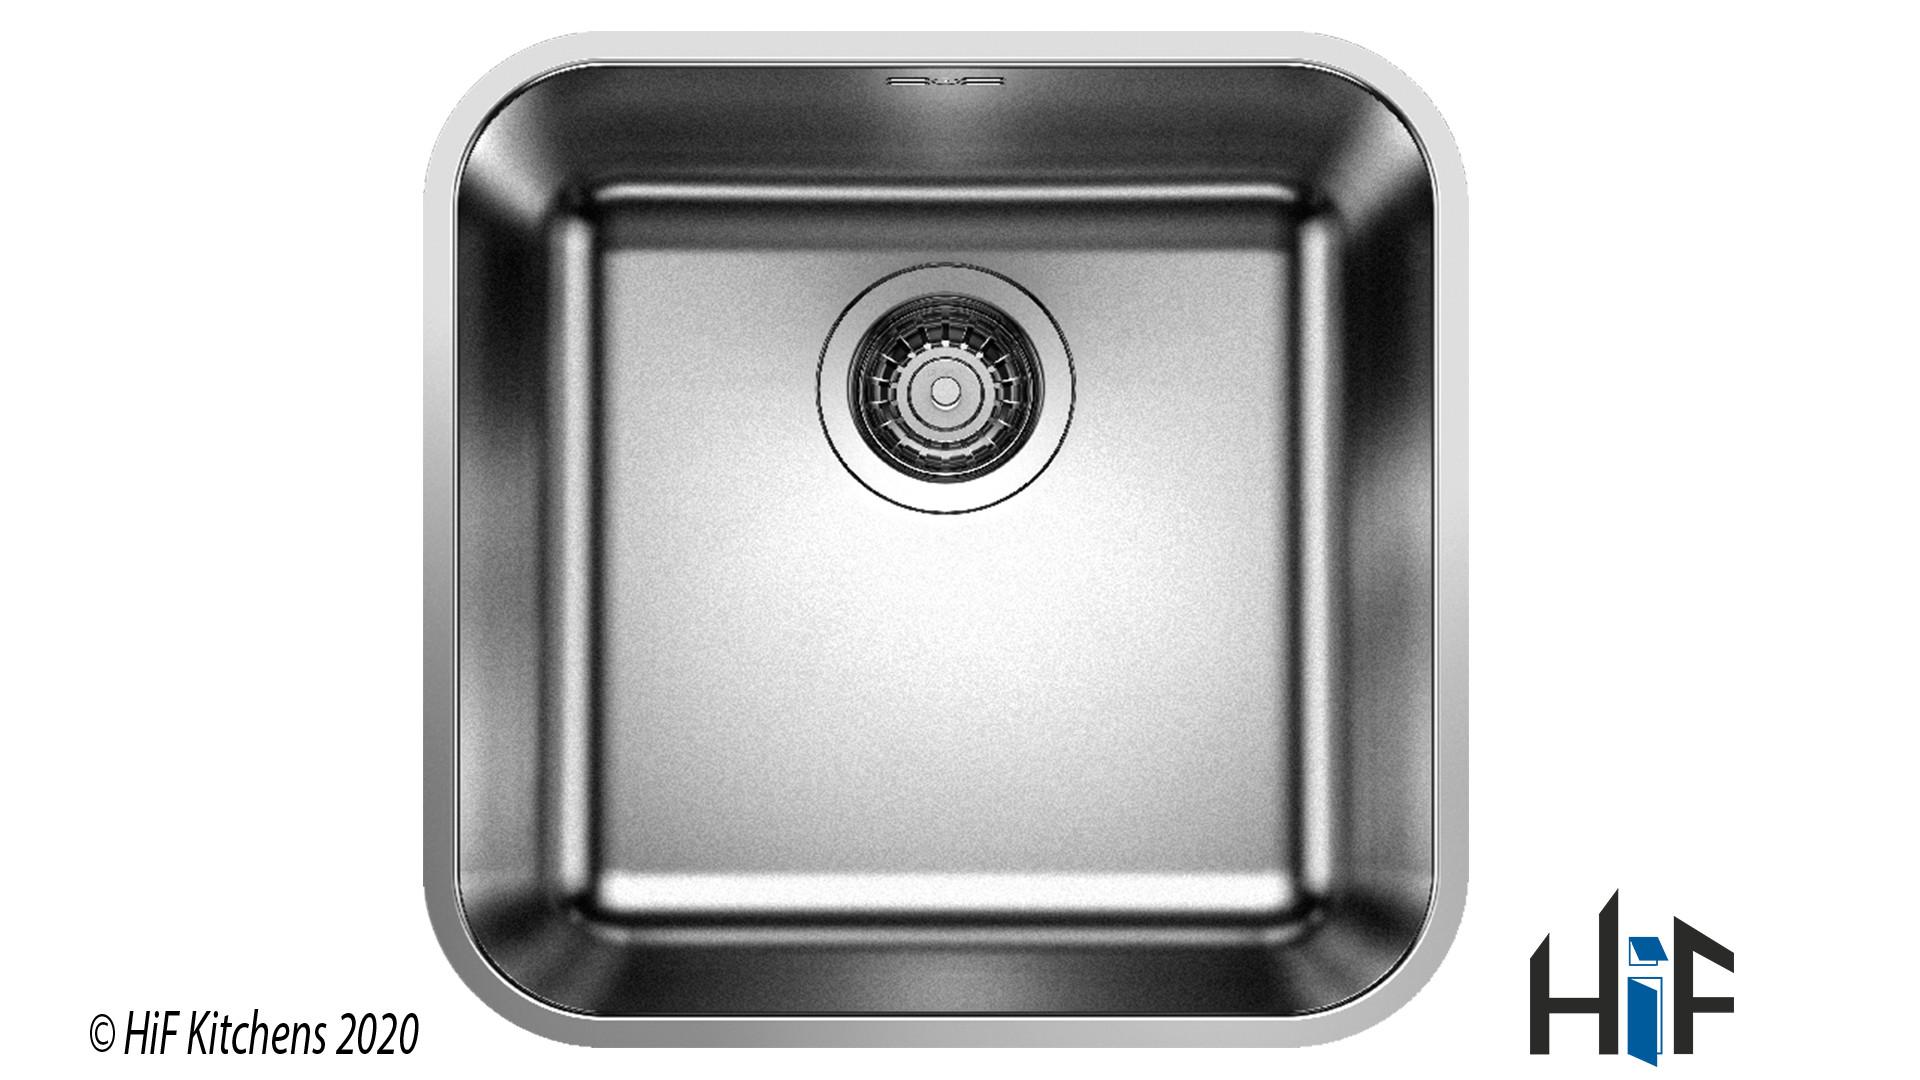 Blanco 452613 Supra 400-U Sink Stainless